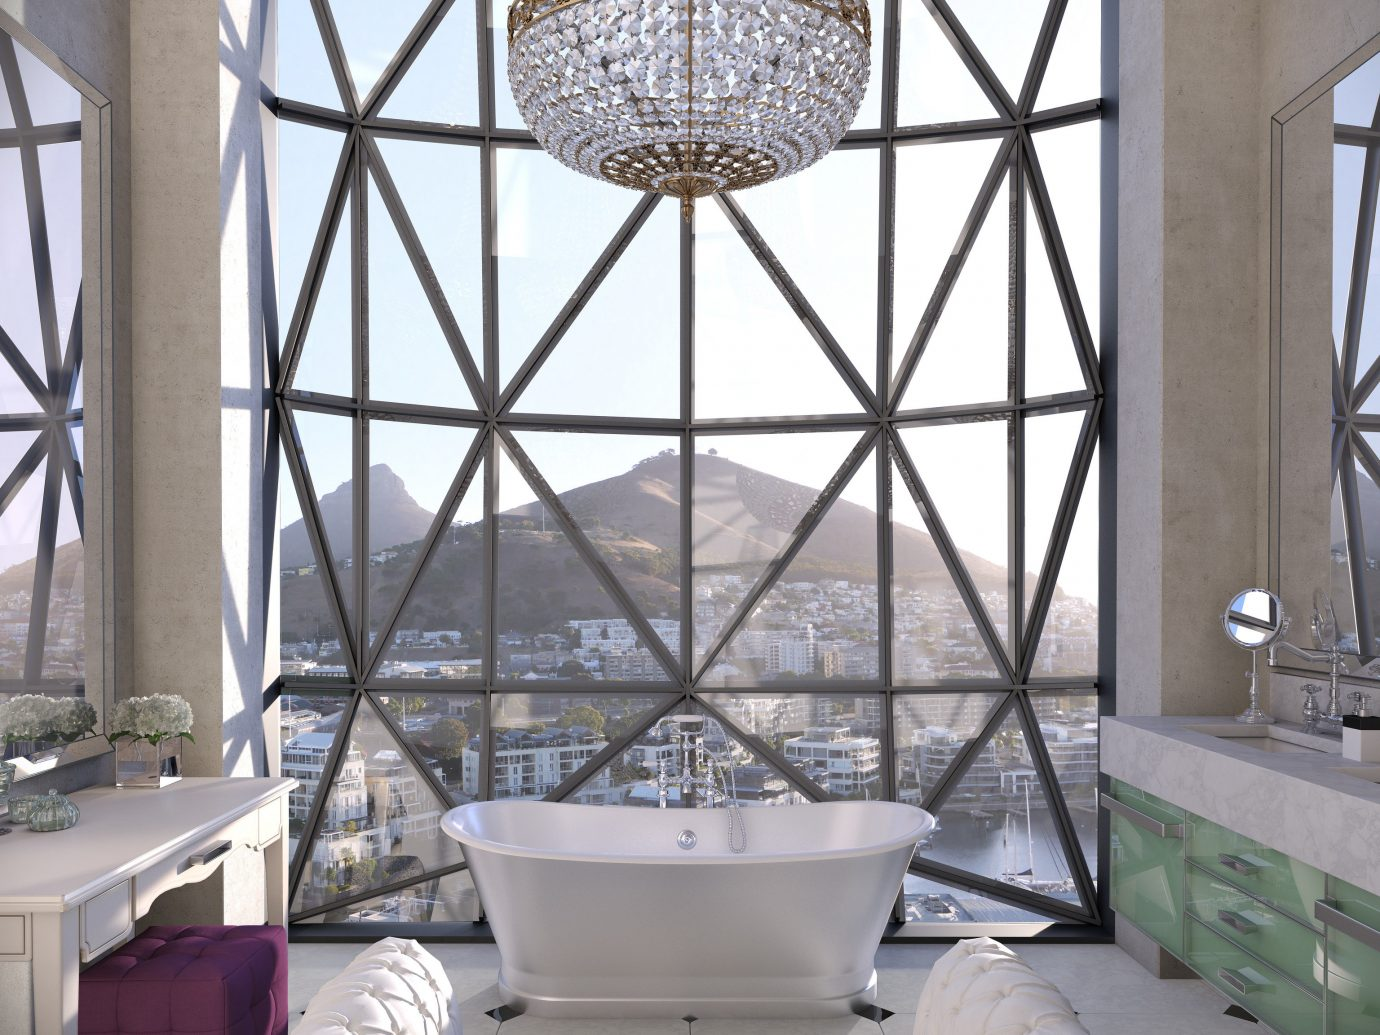 Trip Ideas indoor room daylighting lighting interior design ceiling Design furniture estate living room glass window decorated tiled